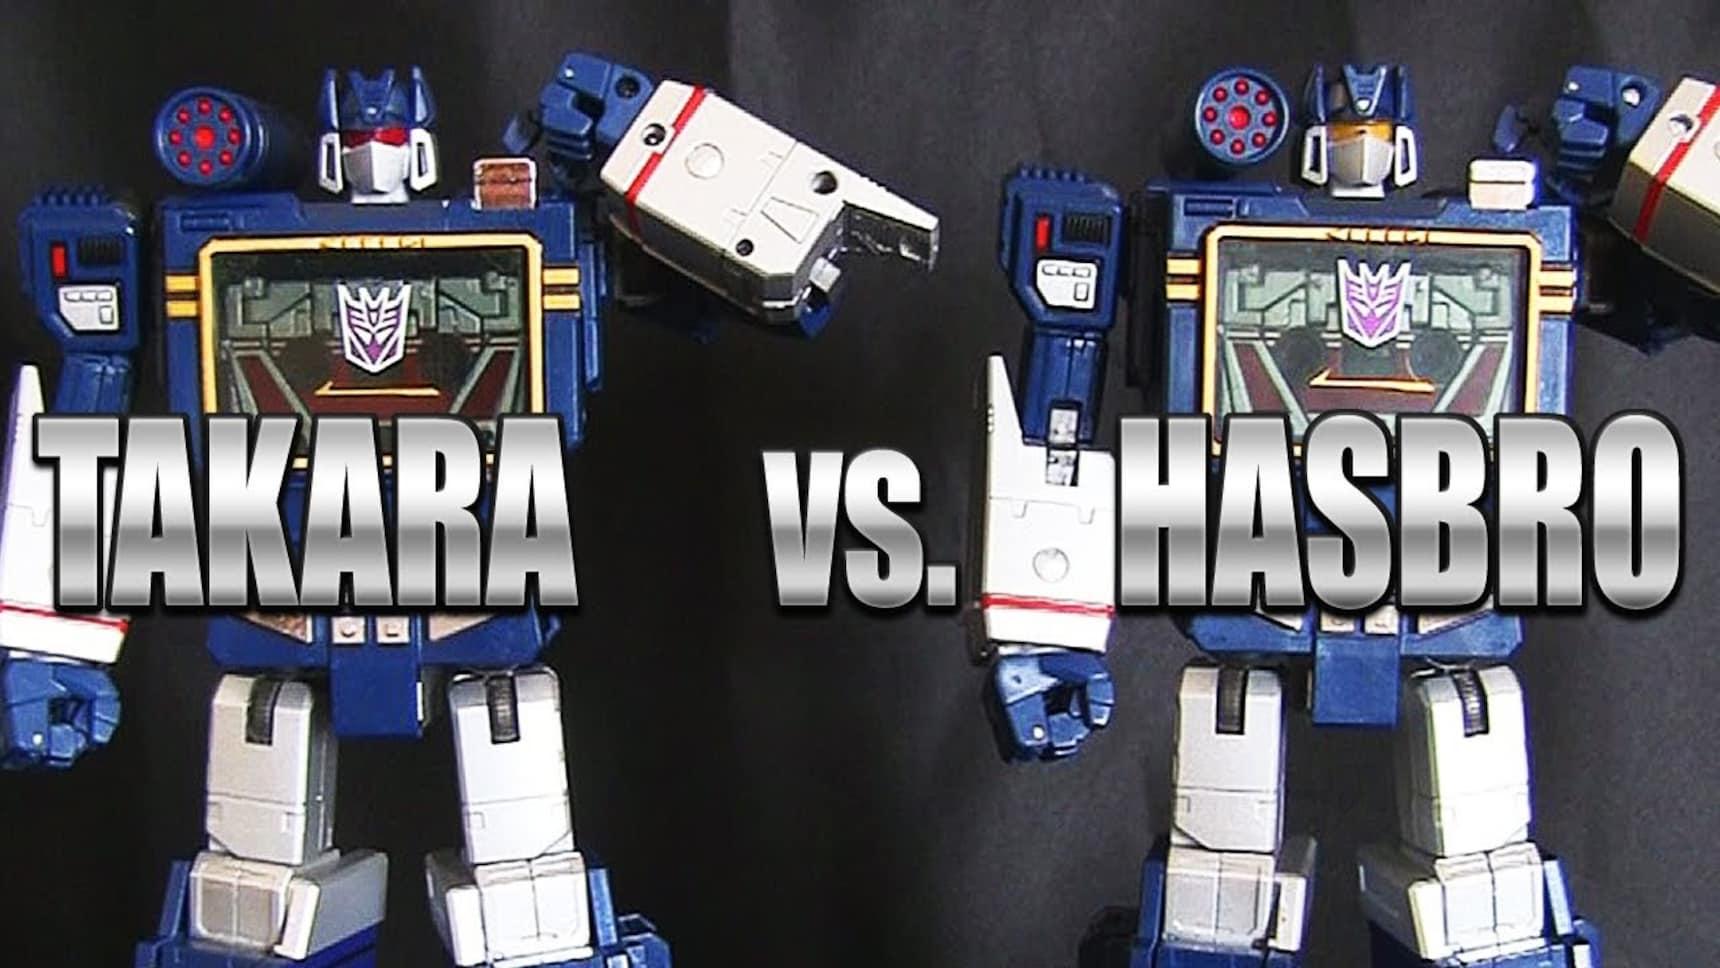 Top 10 Reasons to Buy Takara Tomy Transformers